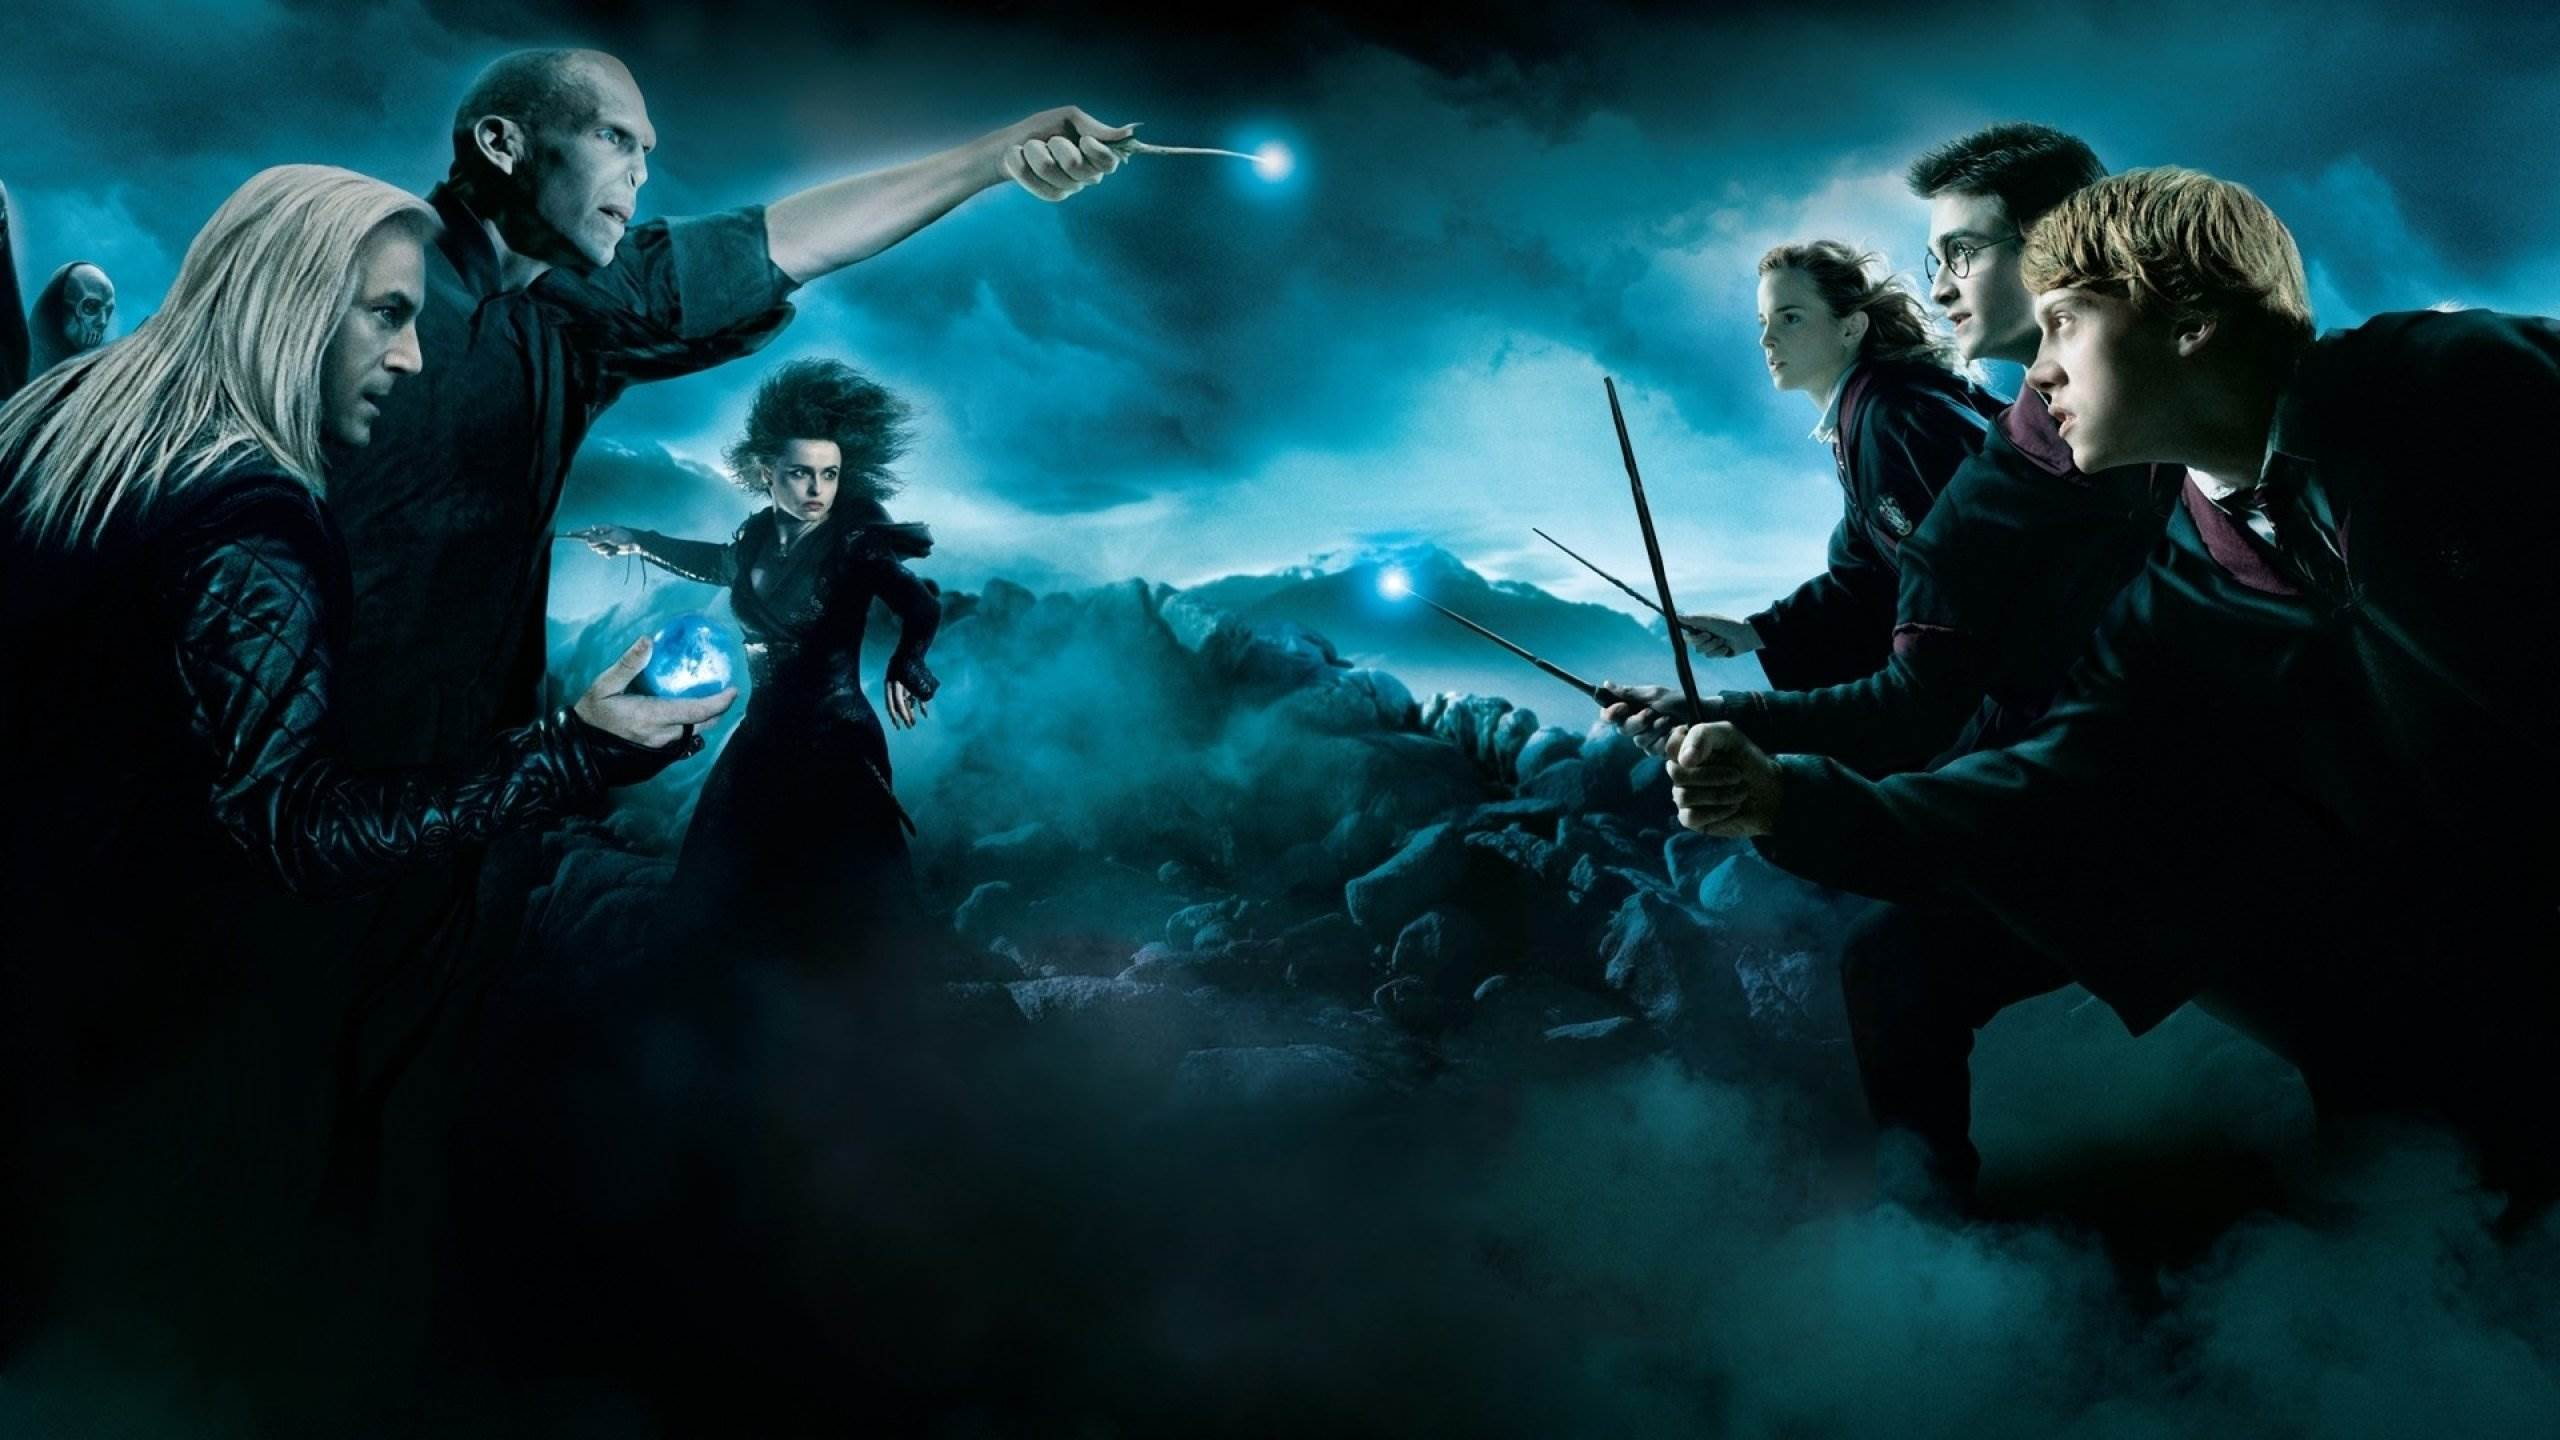 Popular Wallpaper Harry Potter Android - Harry-Potter-Desktop-Backgrounds-082  Pic_649286.jpg